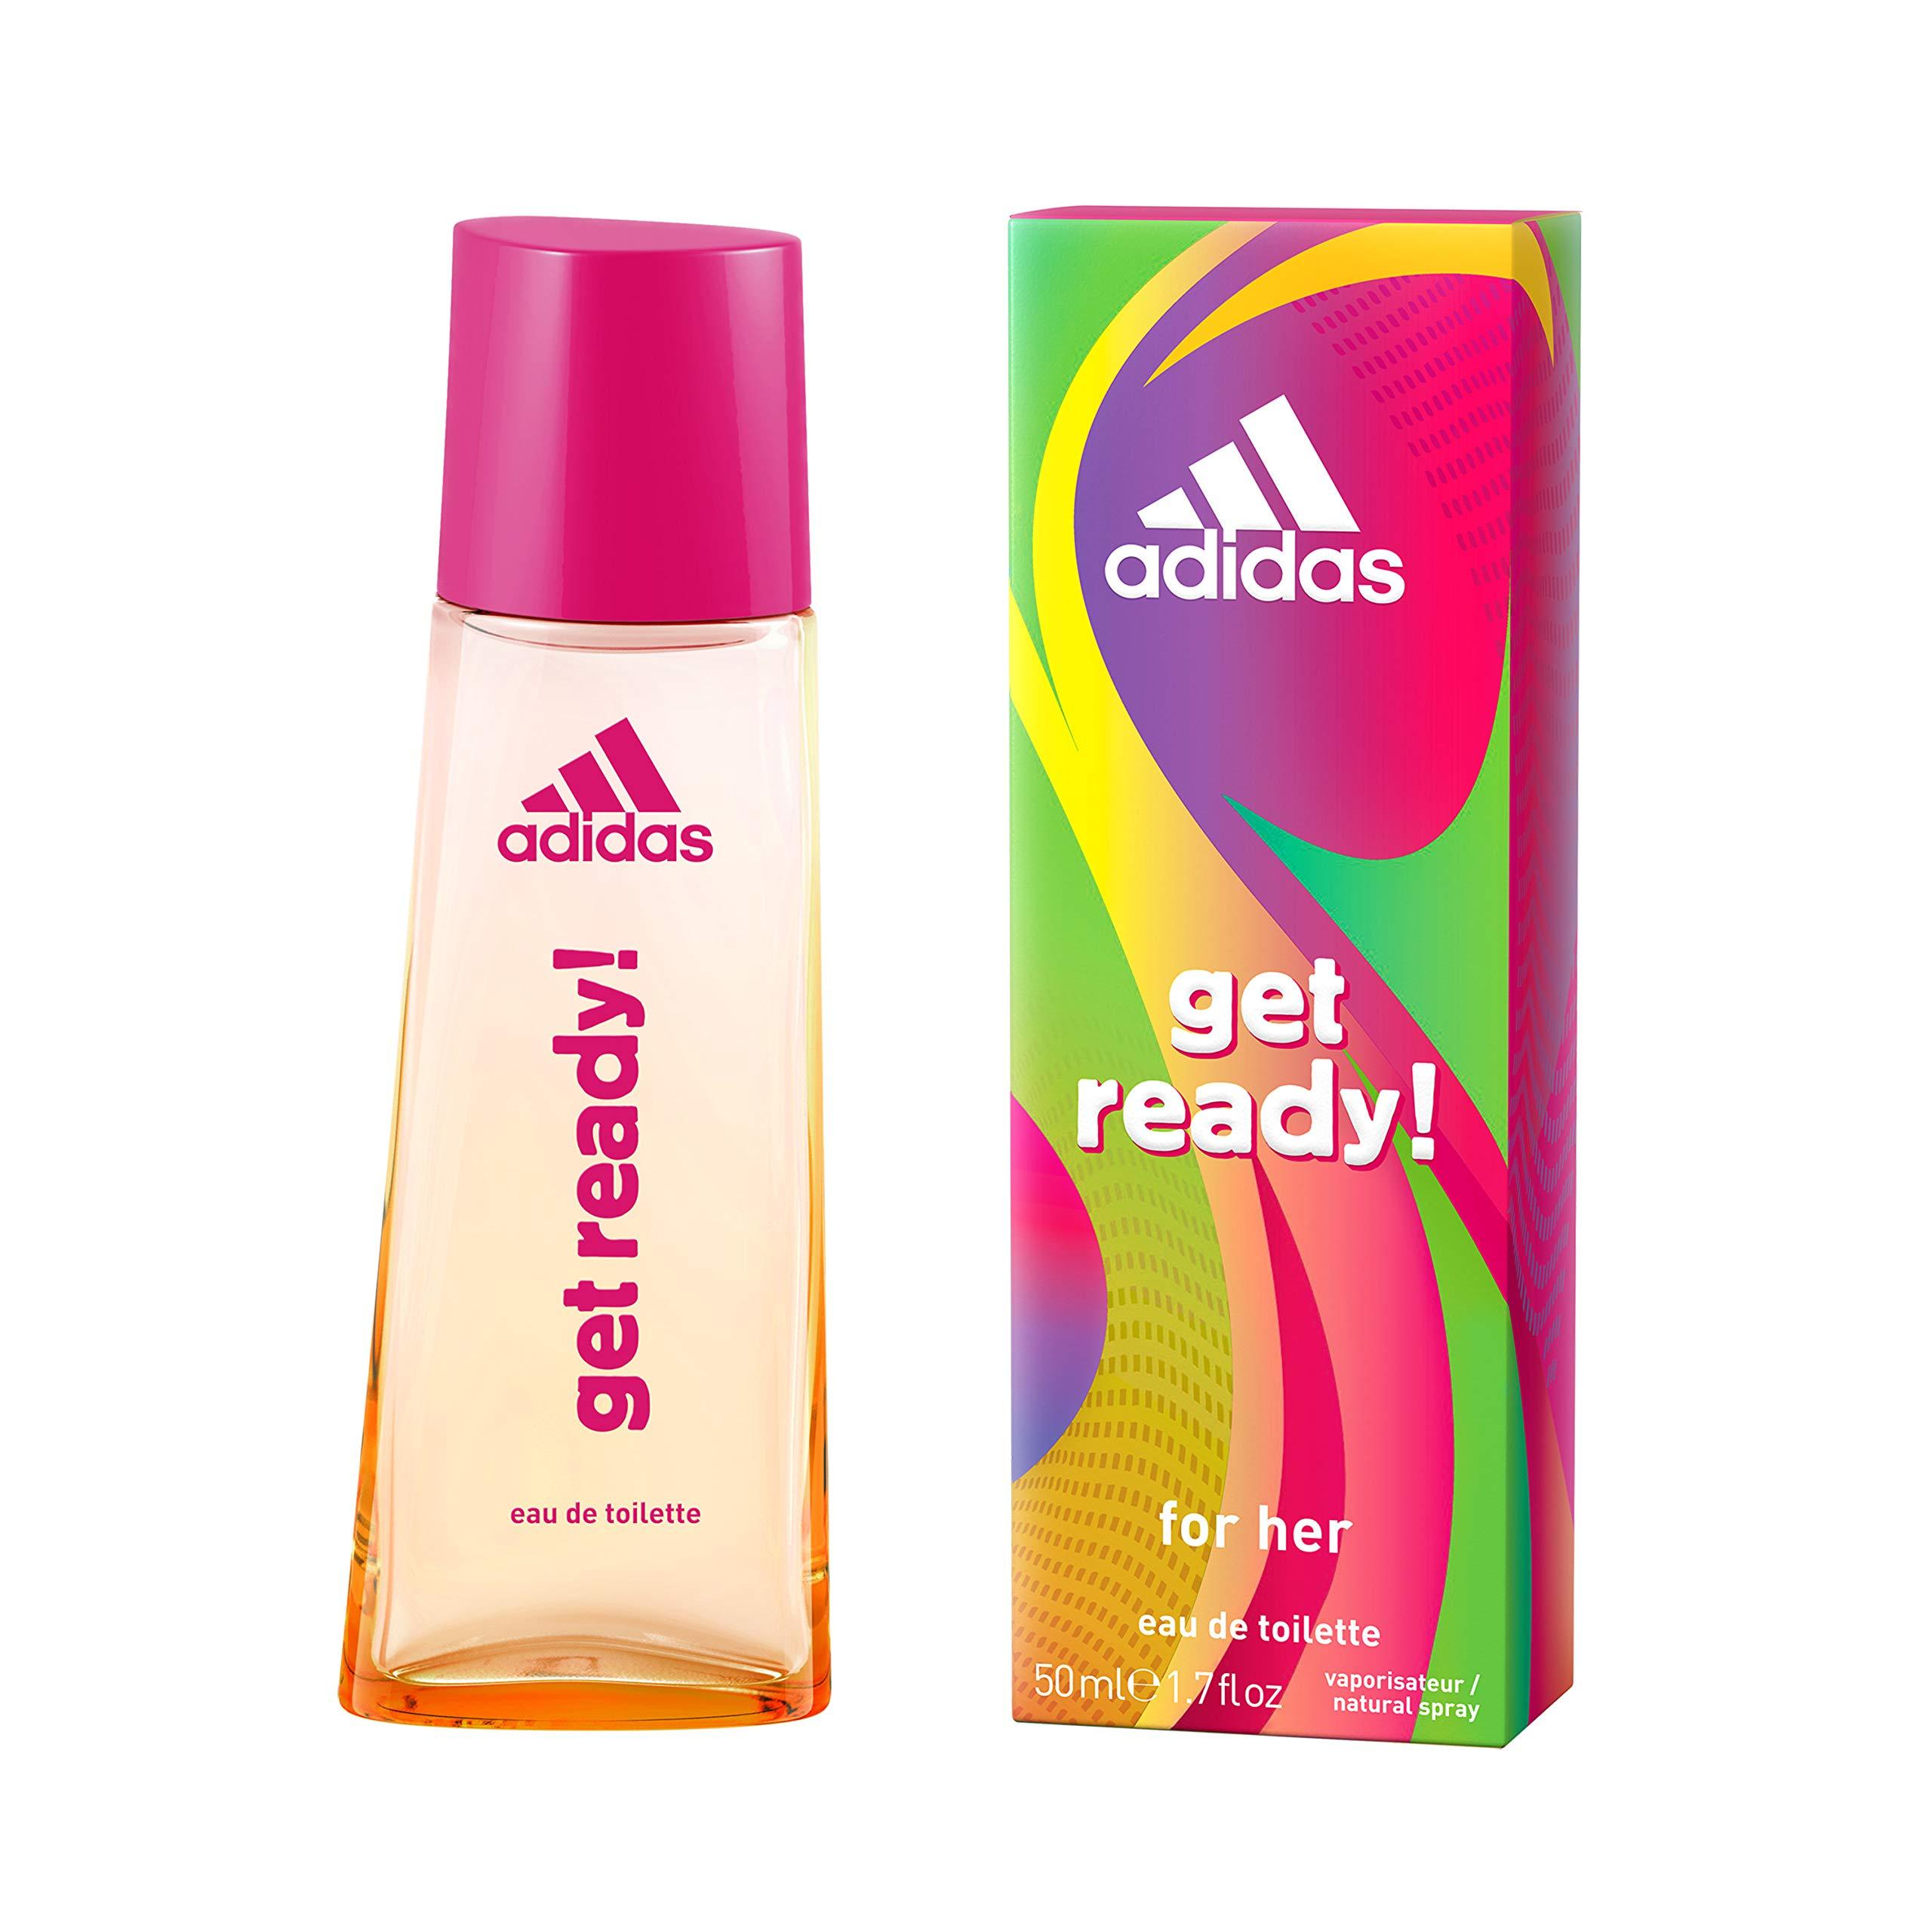 Adidas Get Ready Eau de Toilette para Mujer 50 ml: Amazon